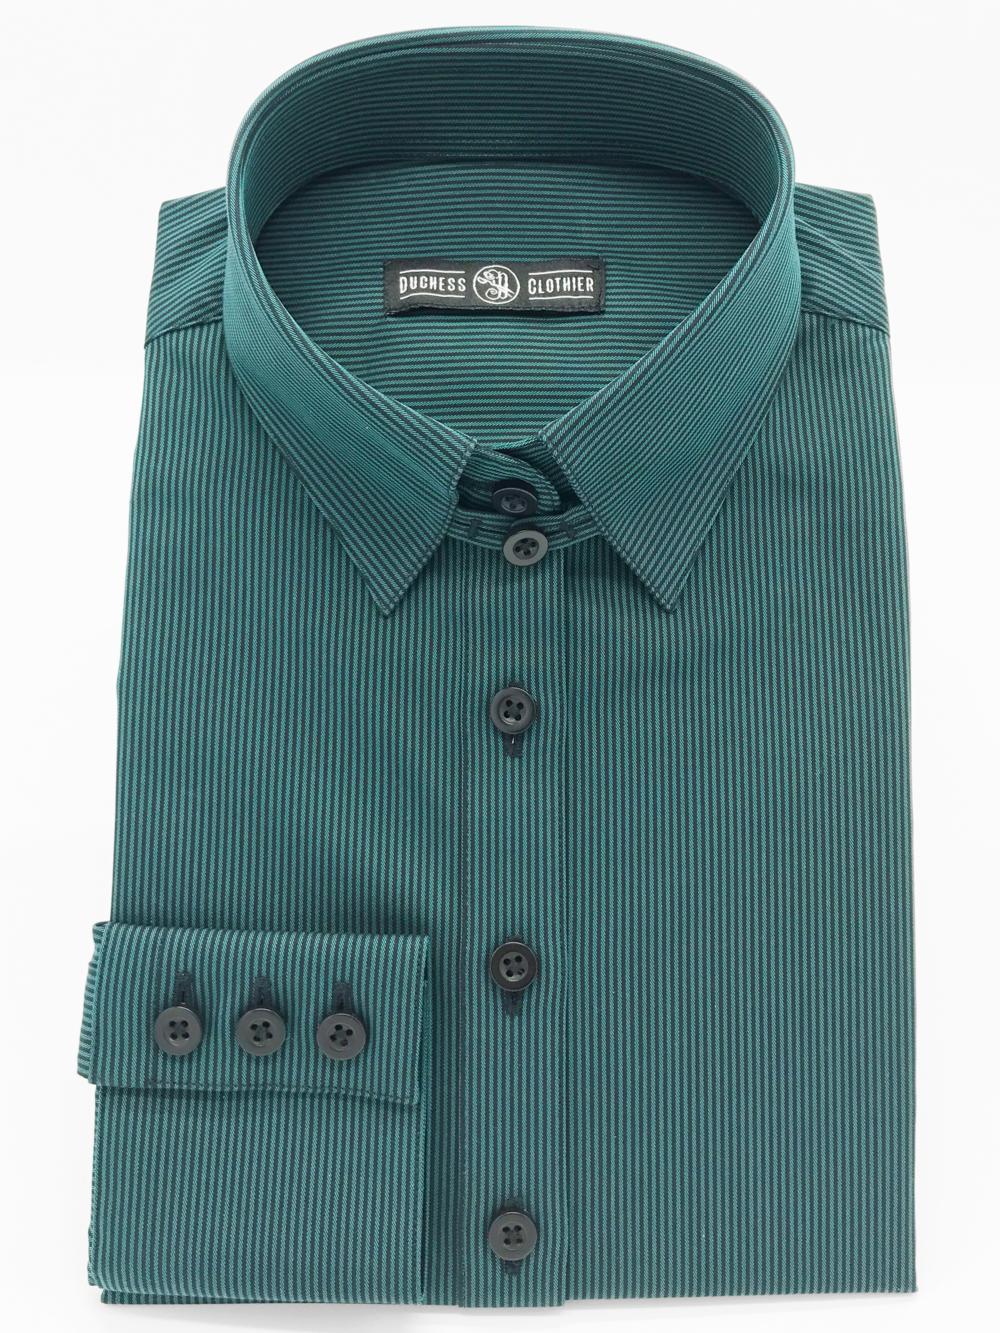 NewShirts-7.png